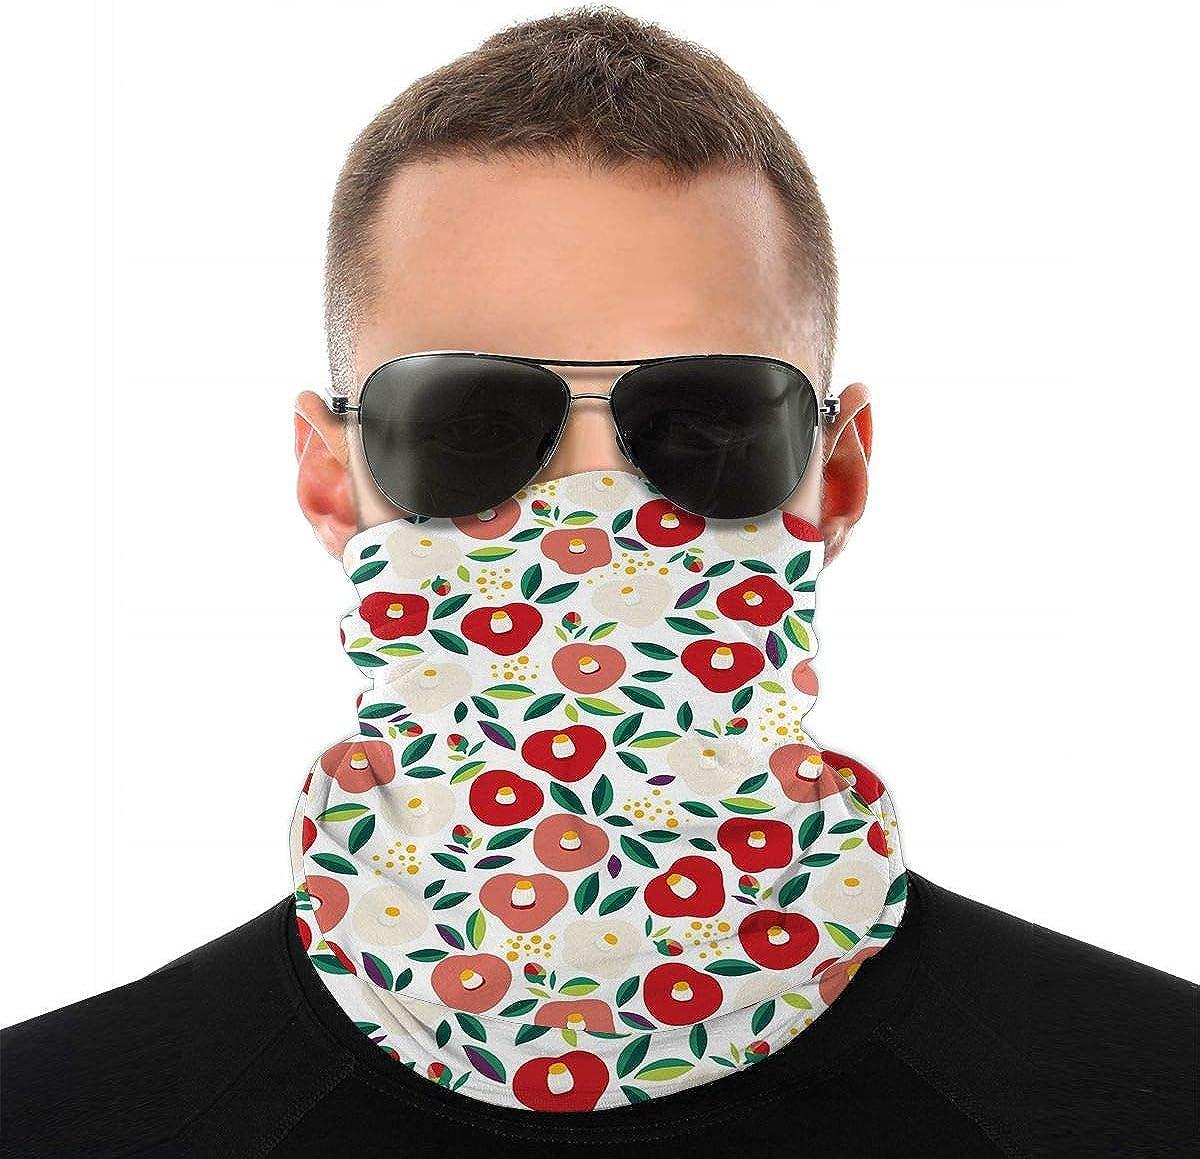 KiuLoam Japanese Camellia Flowers Seamless Face Mask Bandanas Neck Gaiter for Men and Women, Multifunction Headband Scarf for Dust, Outdoors, Sports